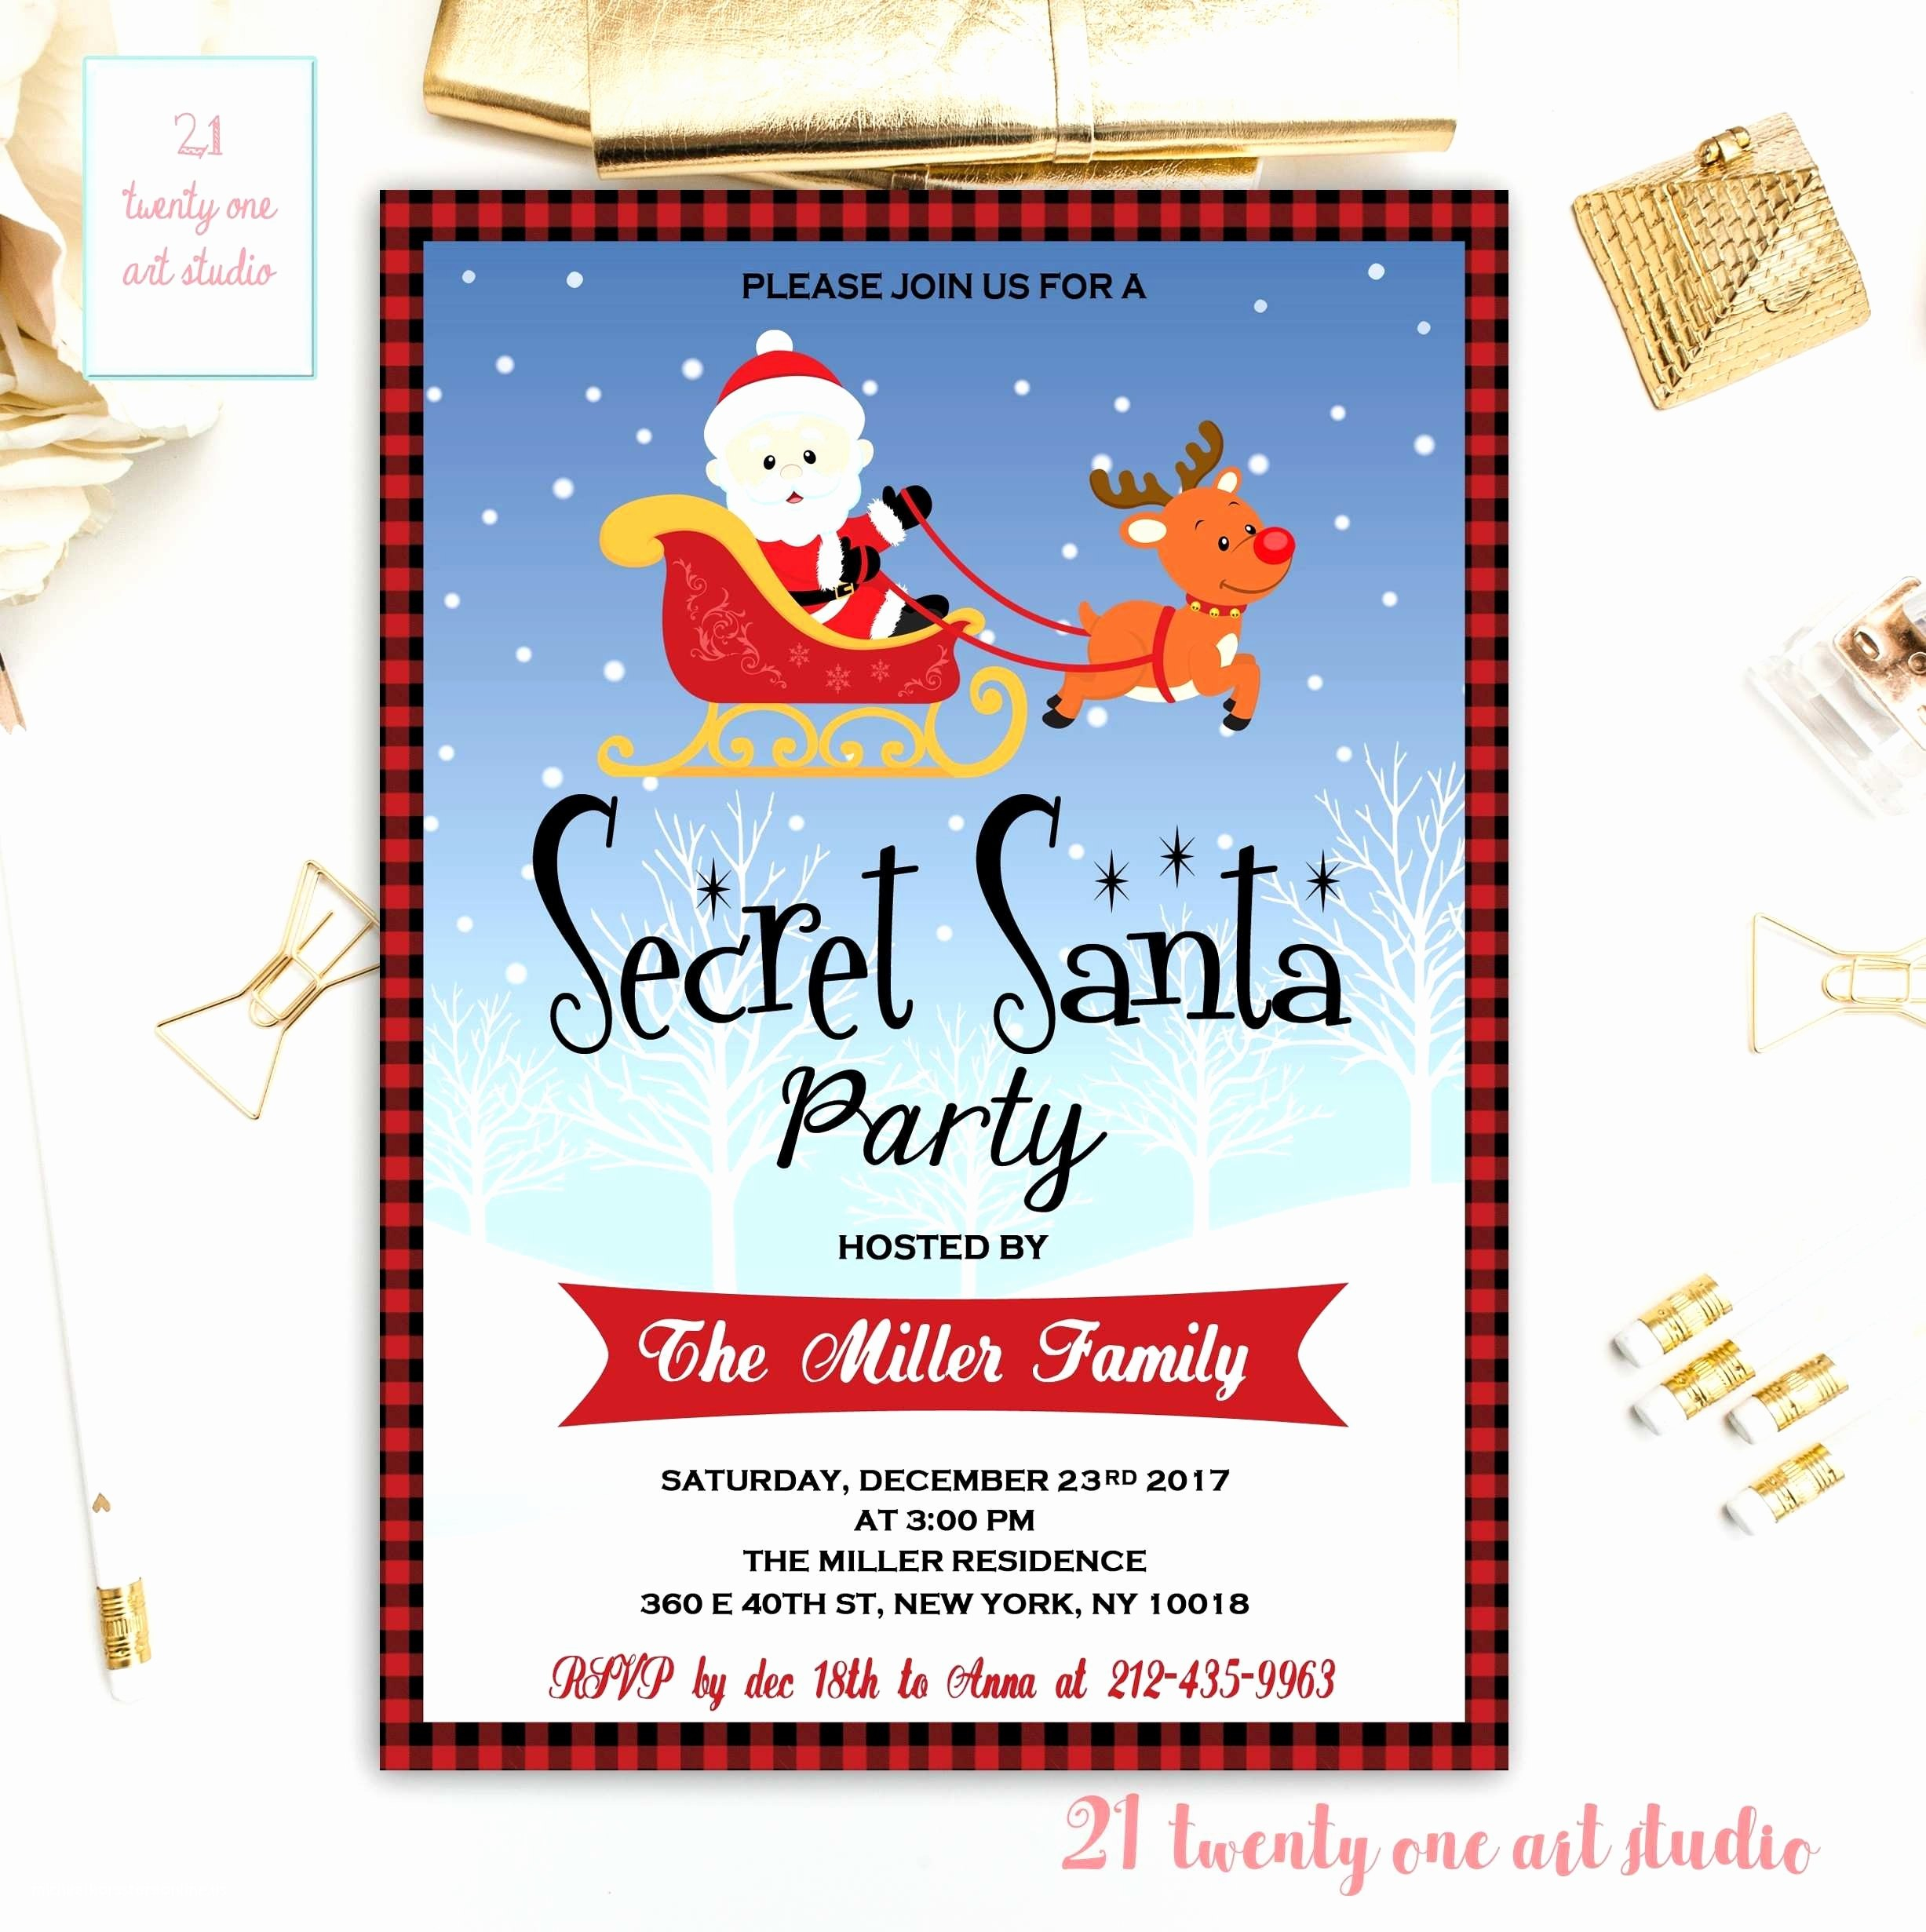 Lovely Print Christmas Cards Online | Birthday Card | Greeting Card - Free Hallmark Christmas Cards Printable